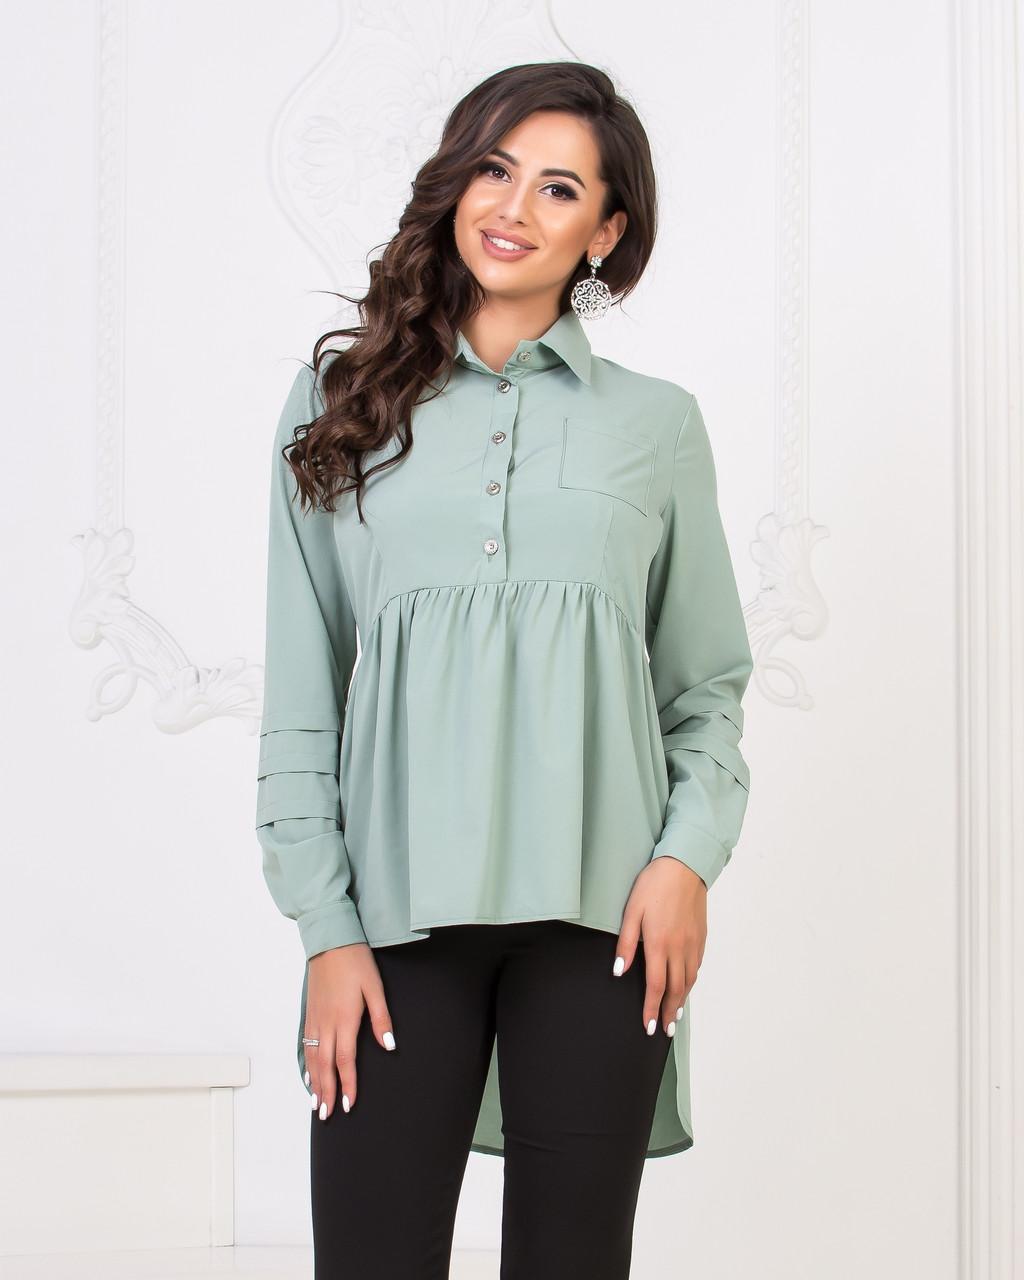 Рубашка-туника сзади удлиненная 04д41114